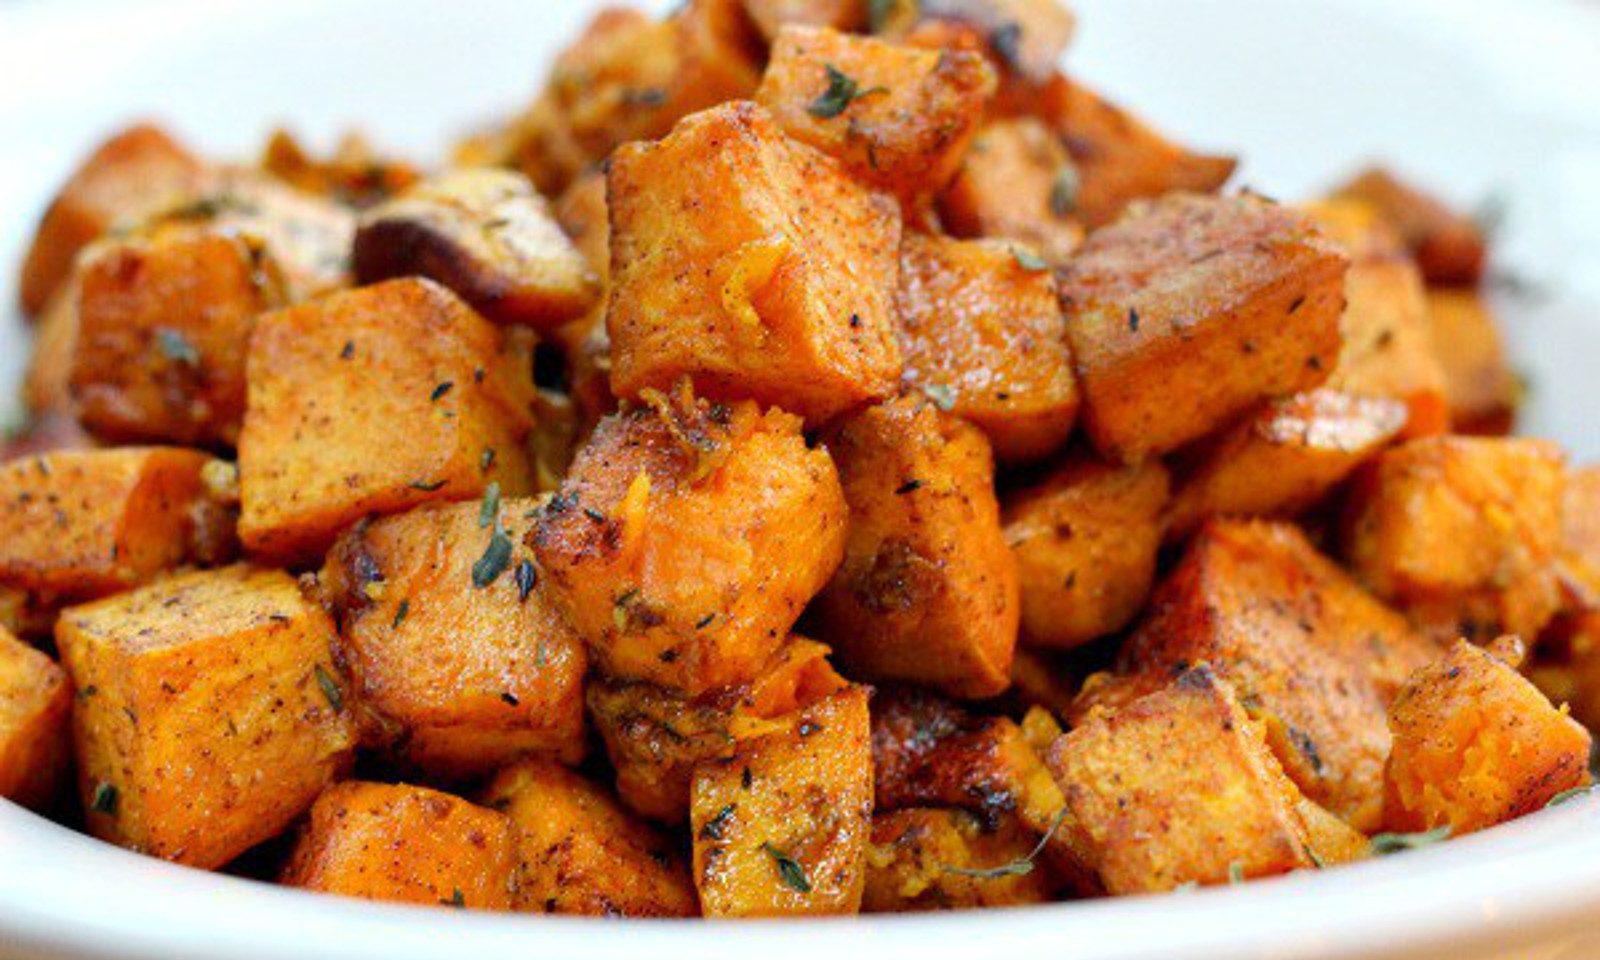 Cinnamon Turmeric Sweet Potatoes 1